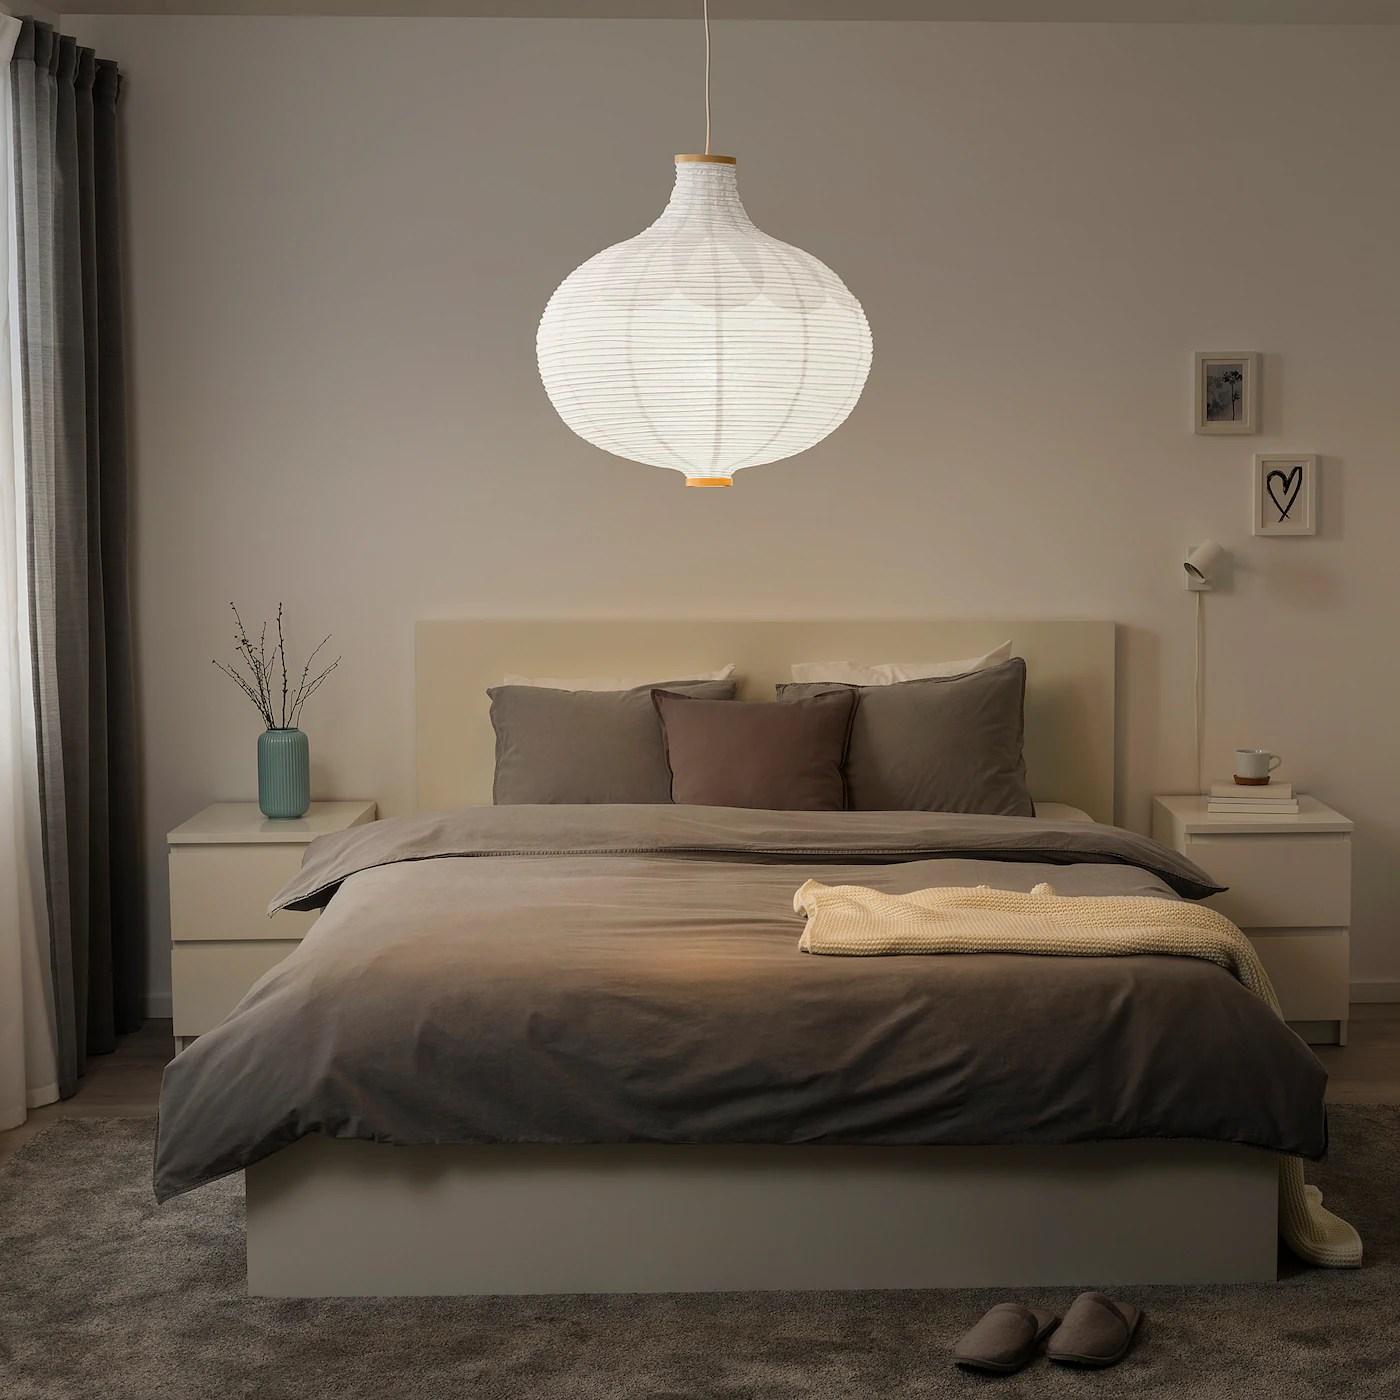 Risbyn Loftlampeskaerm Logformet Hvid 57 Cm Ikea